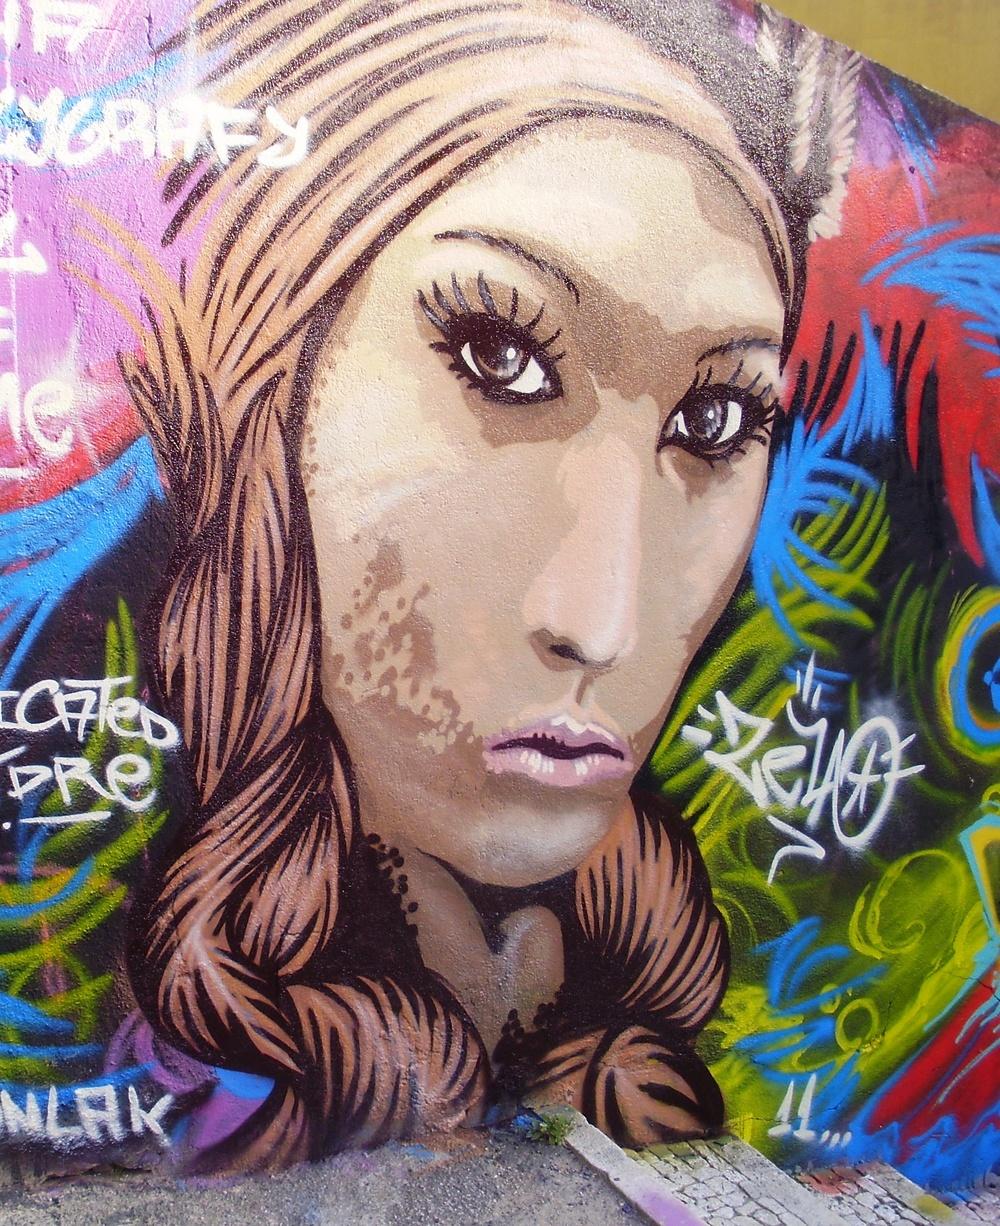 zela graffiti bairro alto 2011.jpg